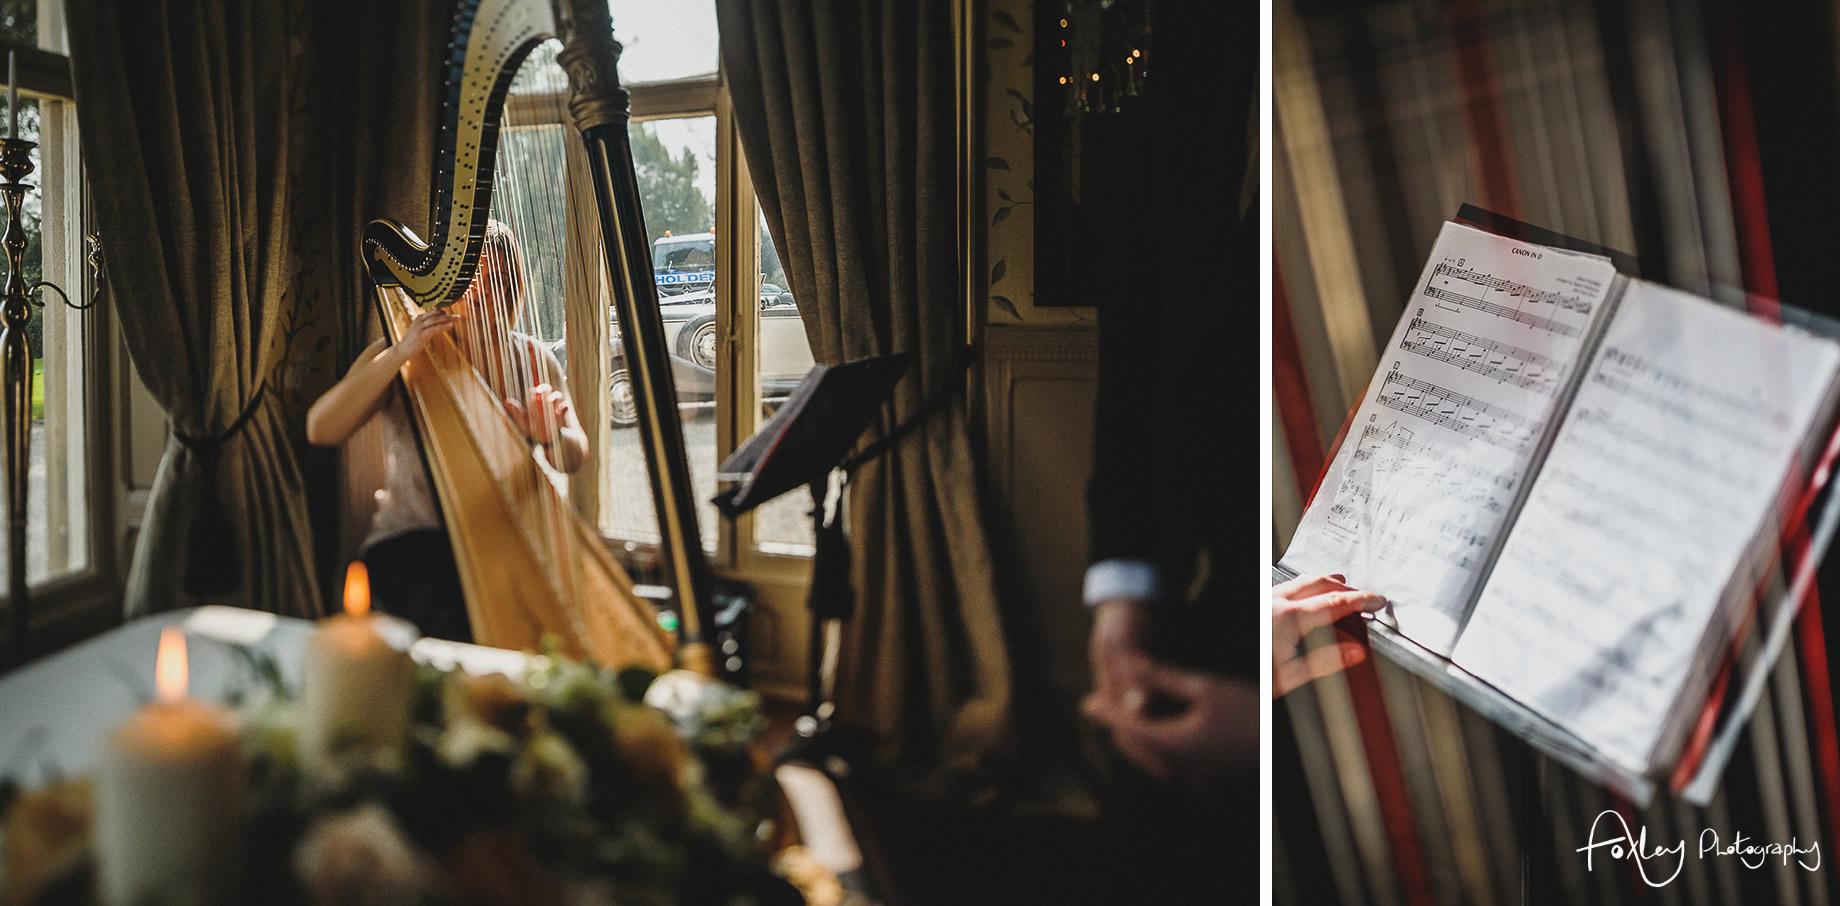 Gemma and Lewis' Wedding at Mitton Hall 065